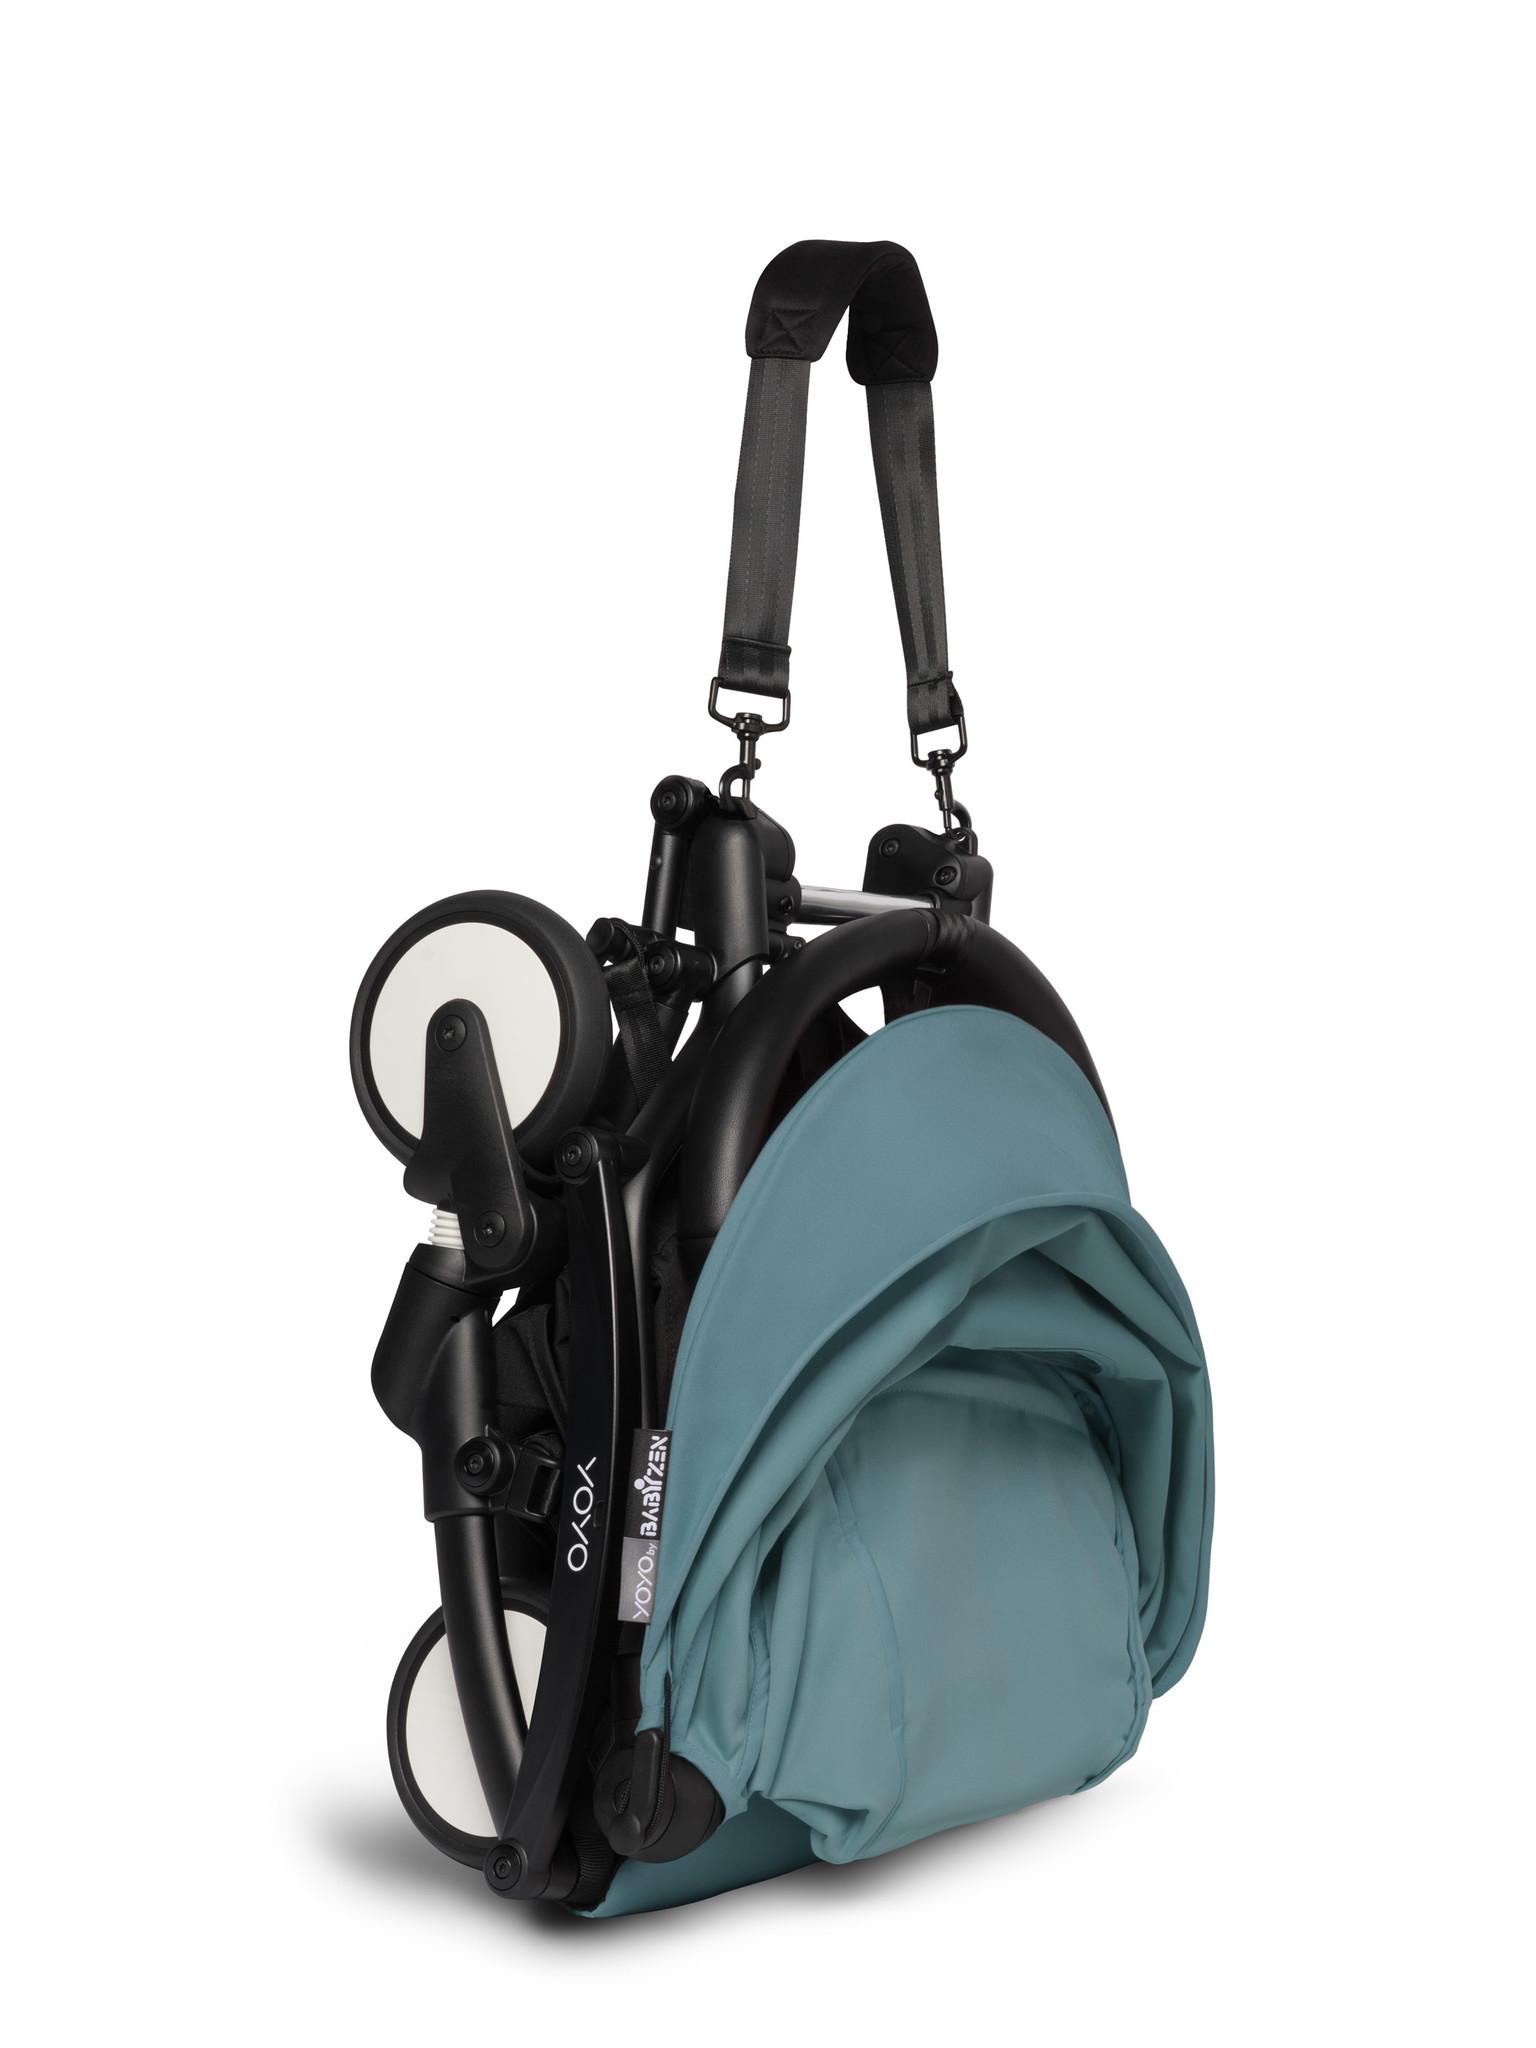 Babyzen Babyzen YOYO² Buggy ab 6 Monaten inklusive Beinstütze - Aqua mit schwarzem Rahmen